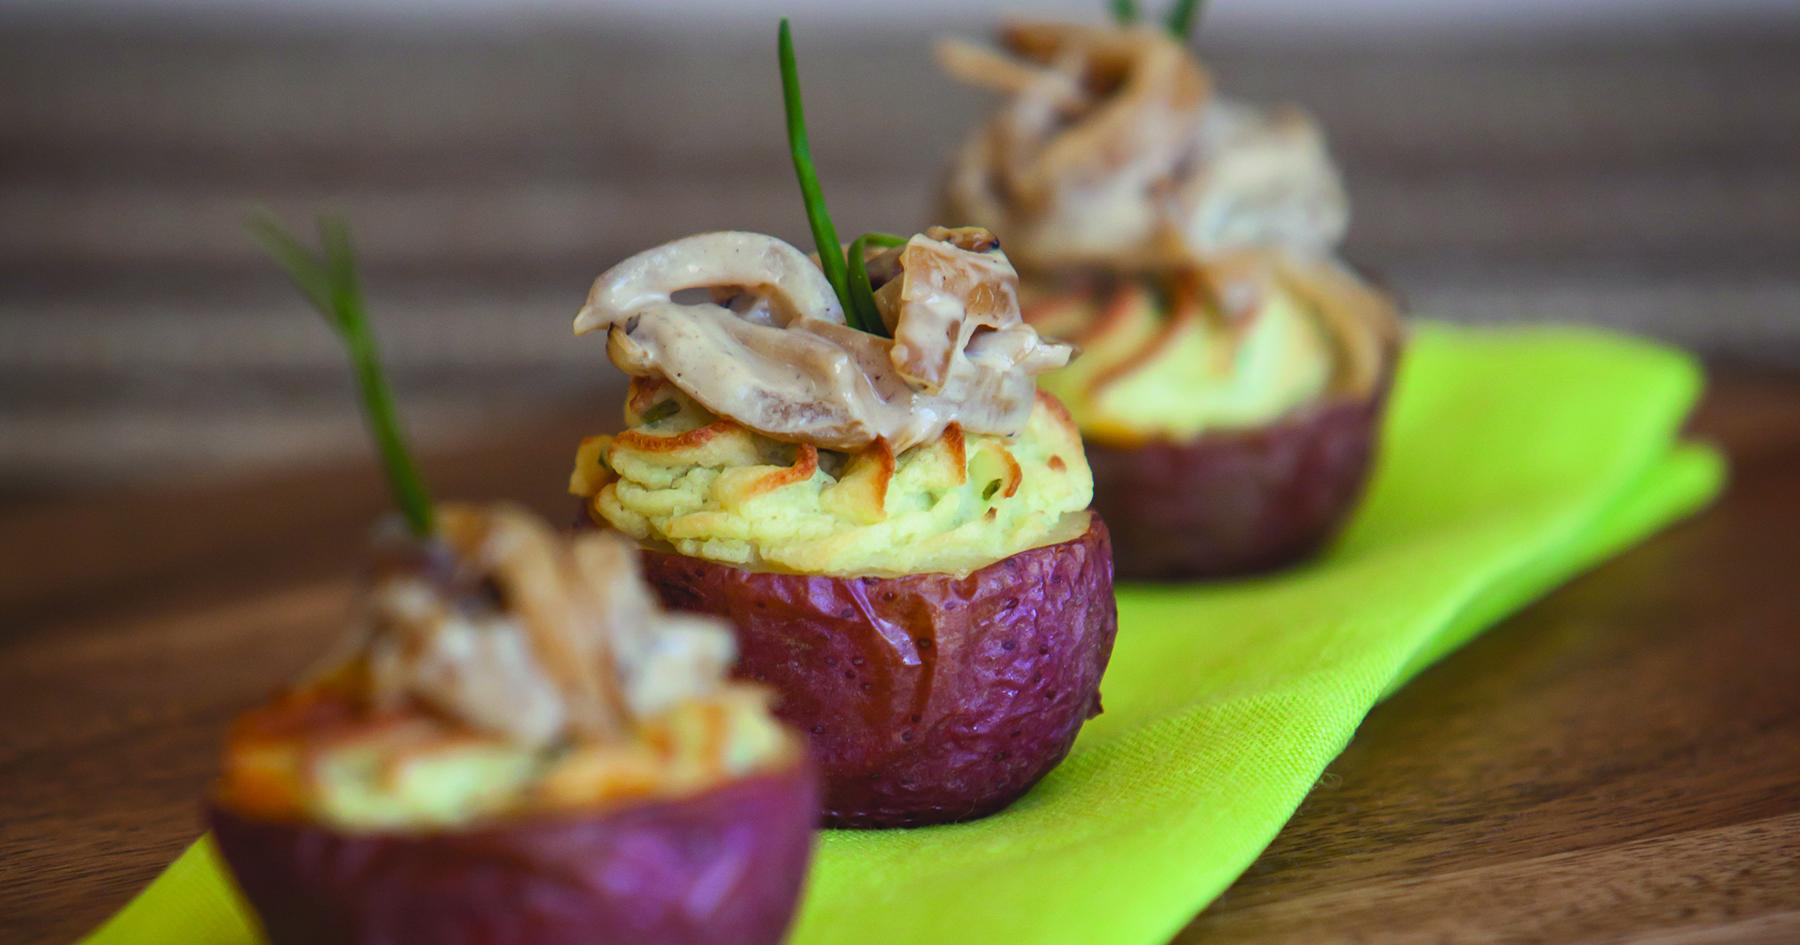 Caramelized Onion Stuffed Potatoes